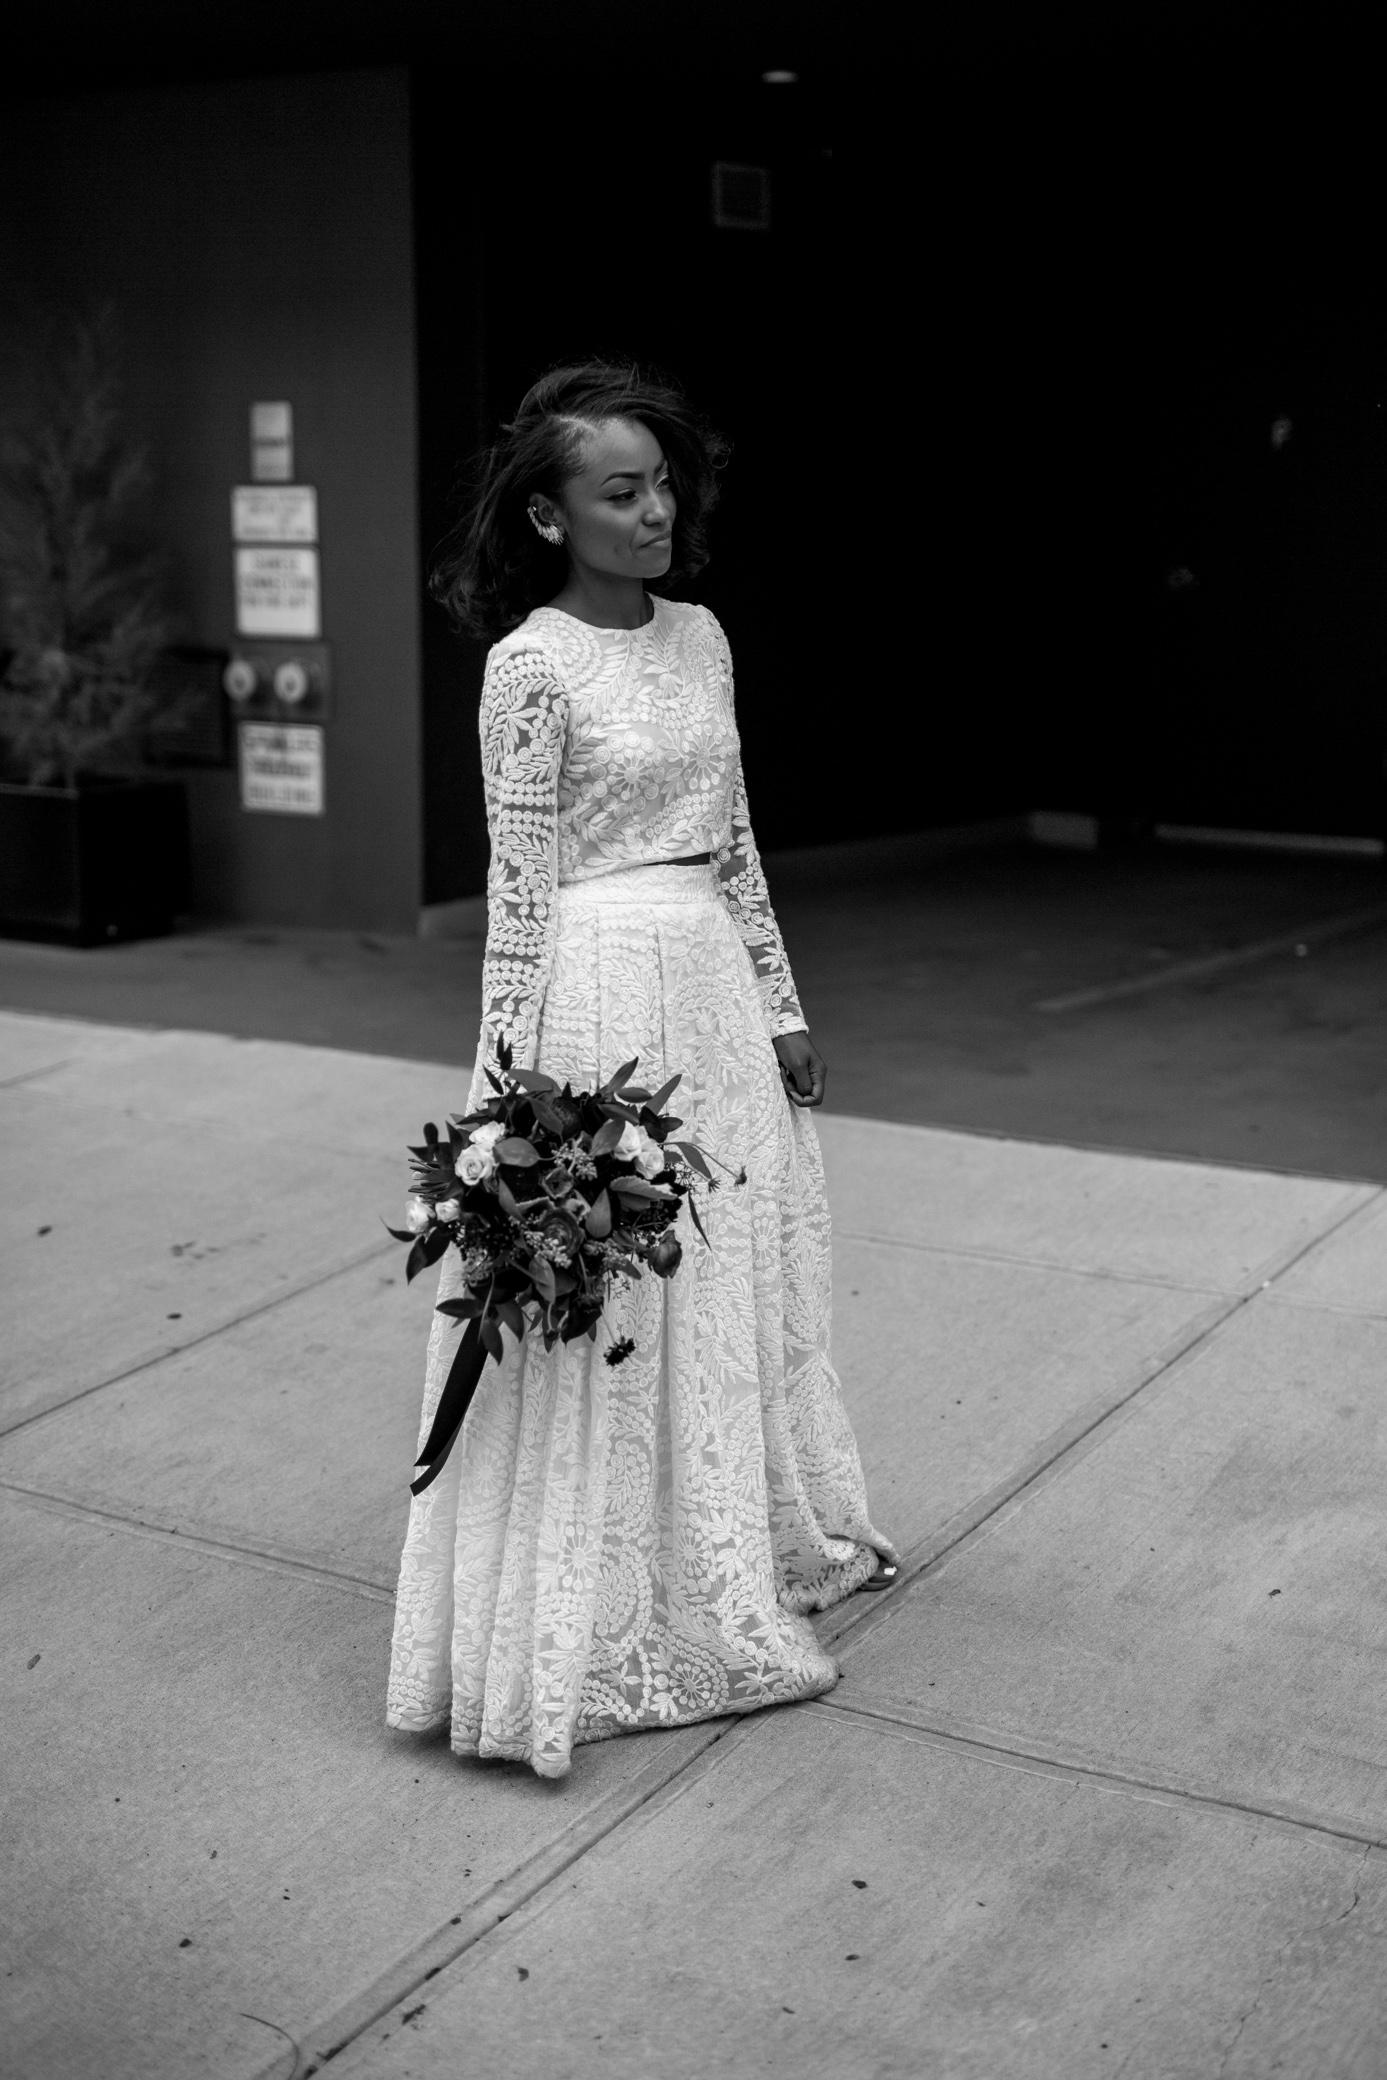 mr-theodore_white-vine-photography_same-sex-wedding-directory2.jpg